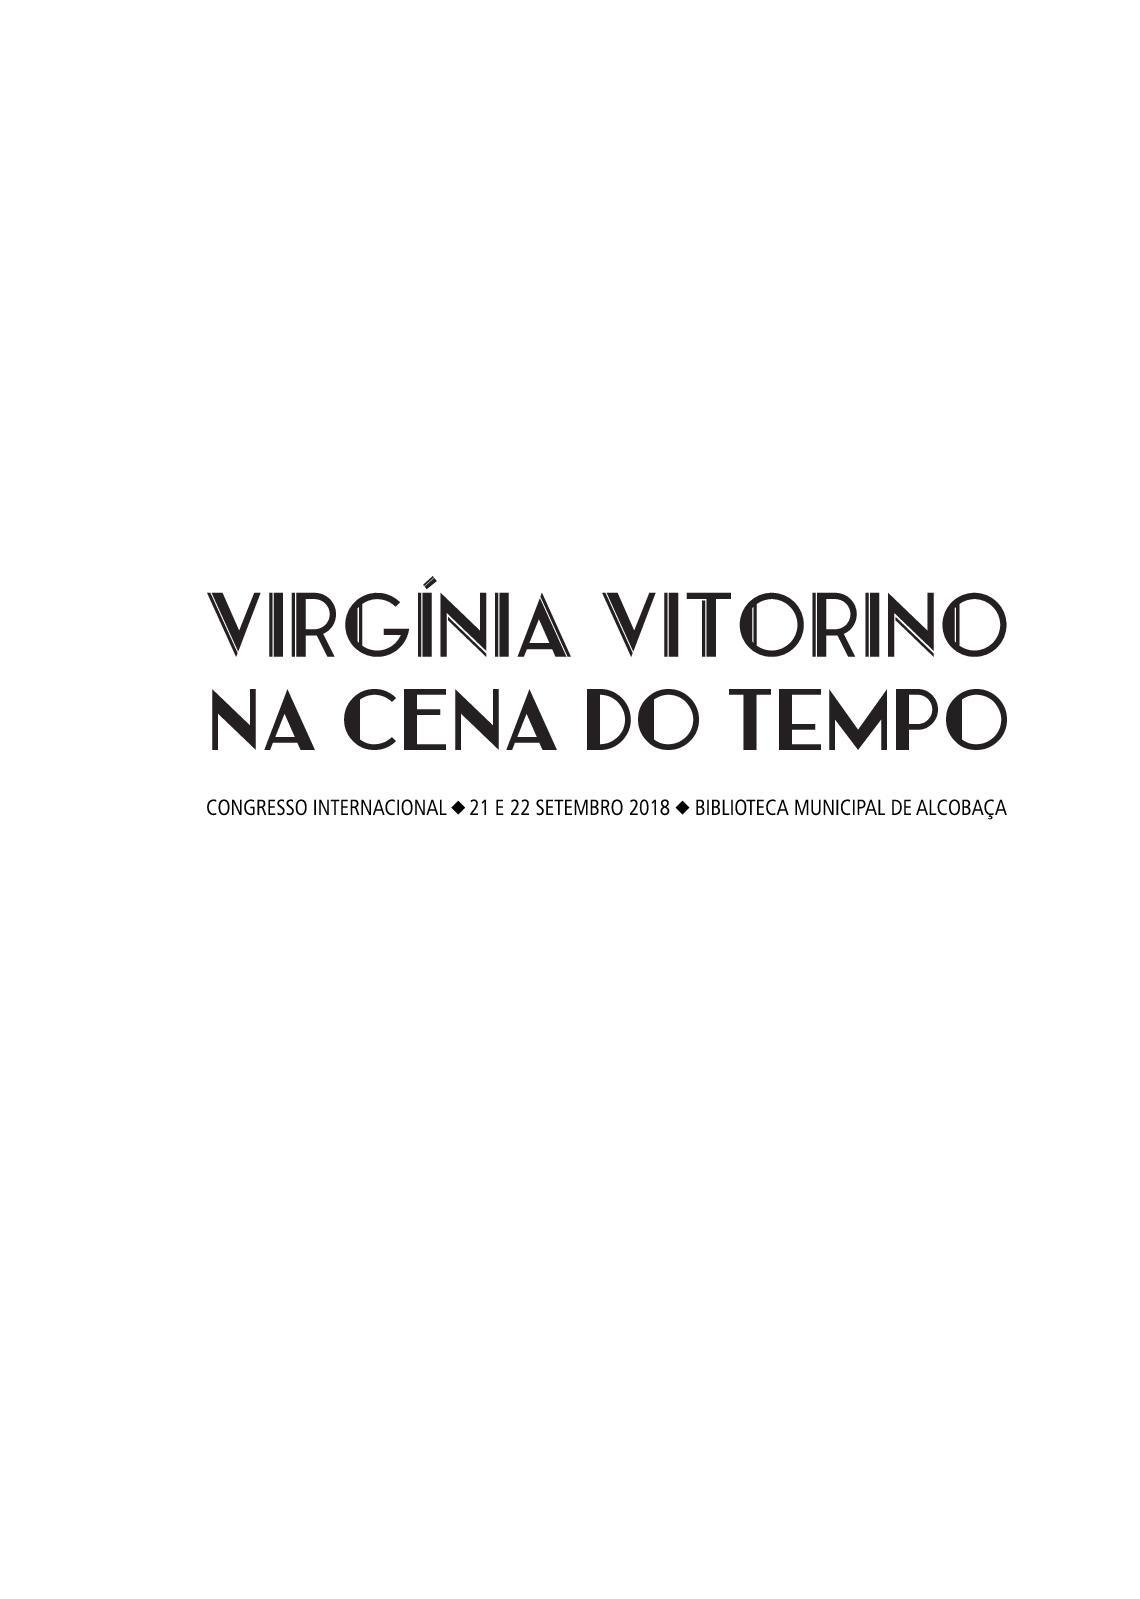 Ana Maria Braga Chica Doida calaméo - virginia vitorino - na cena do tempo